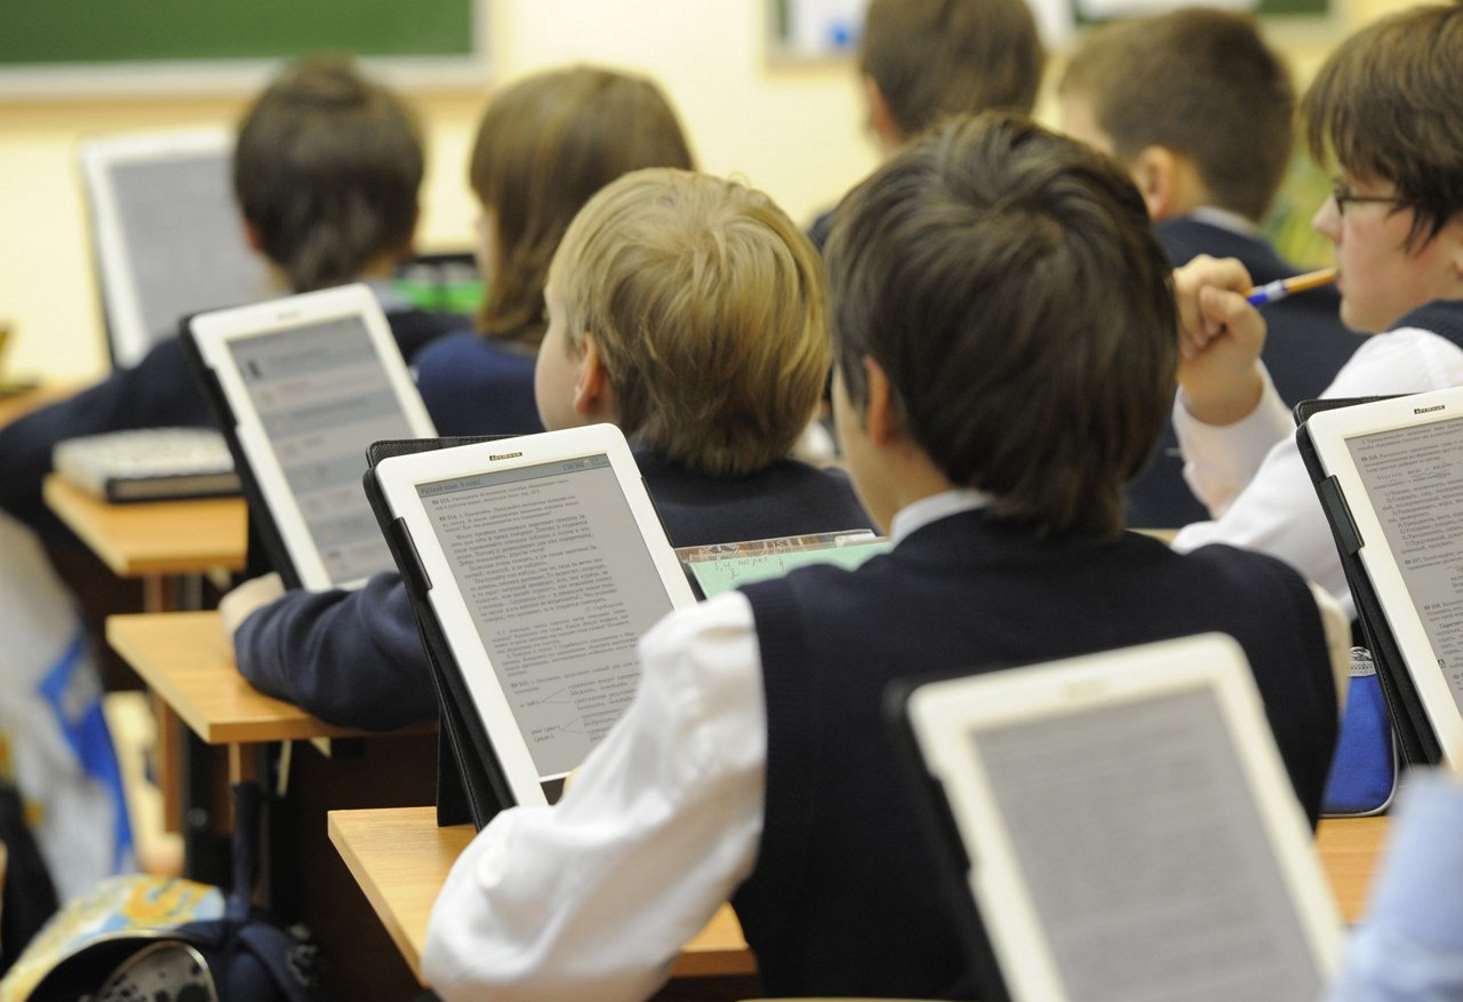 deputat-gosdumy-predlozhil-zapretit-wi-fi-v-shkolah-i-detskih-sadah